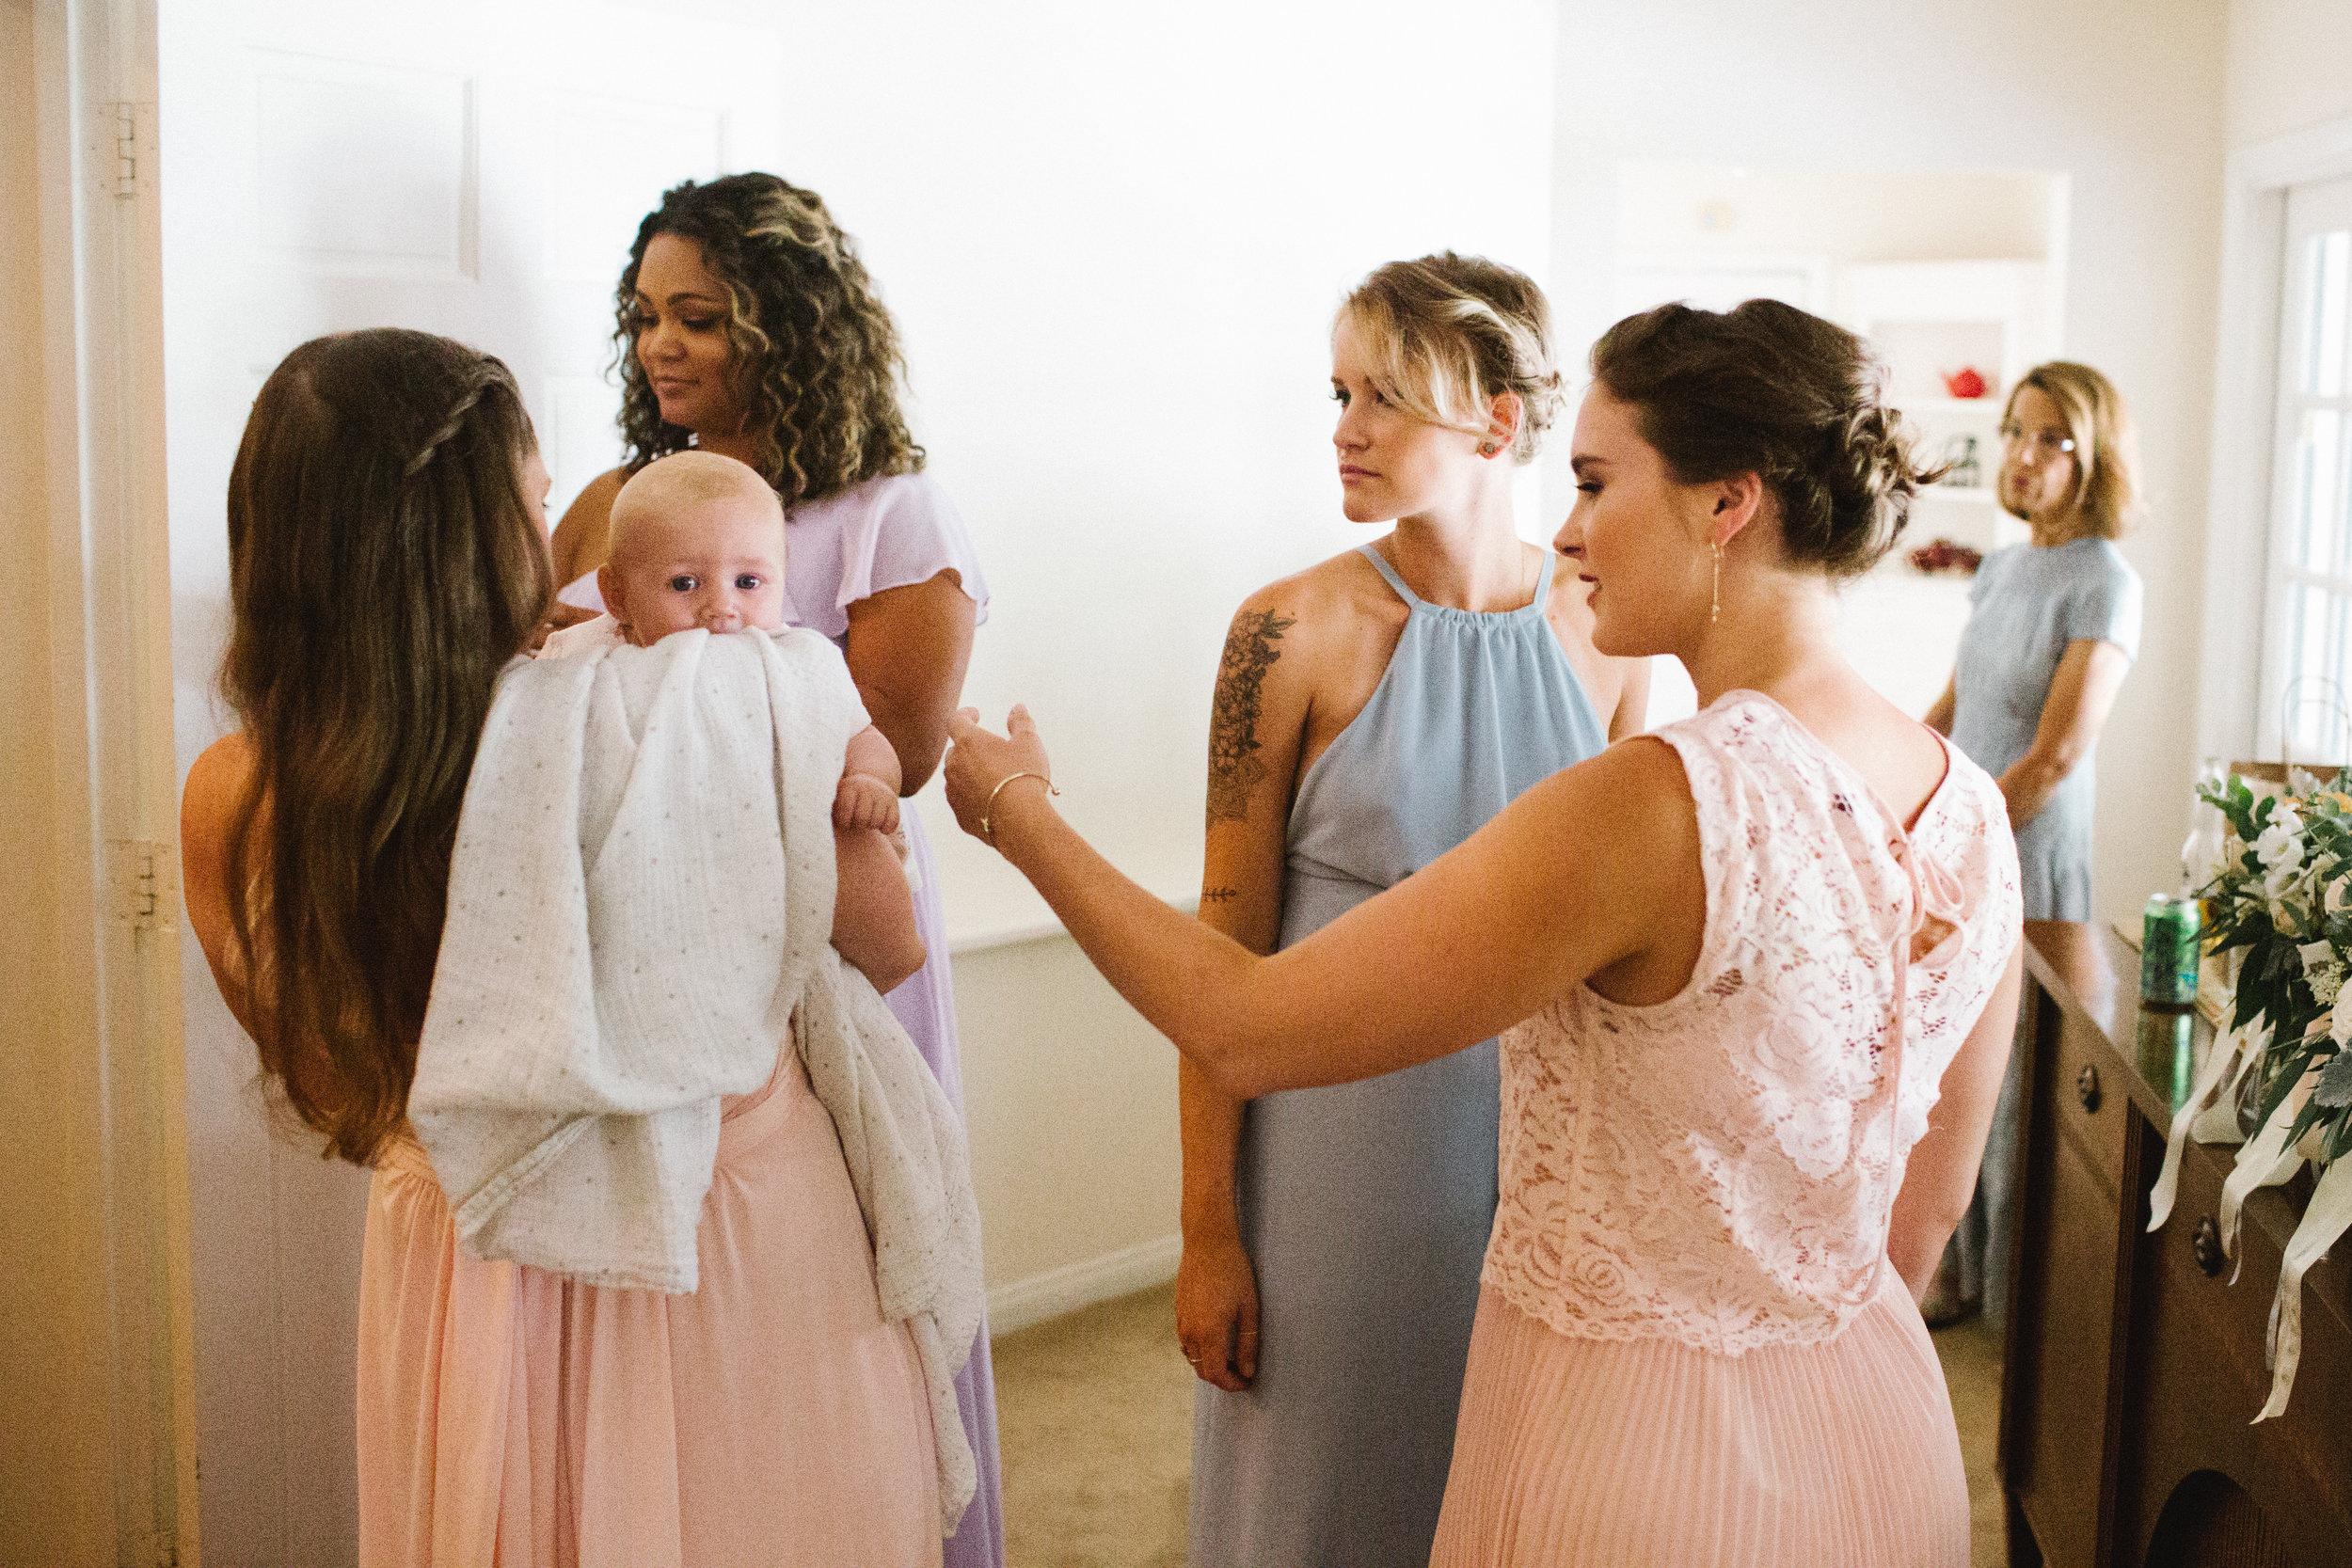 Babies_at_a_Wedding